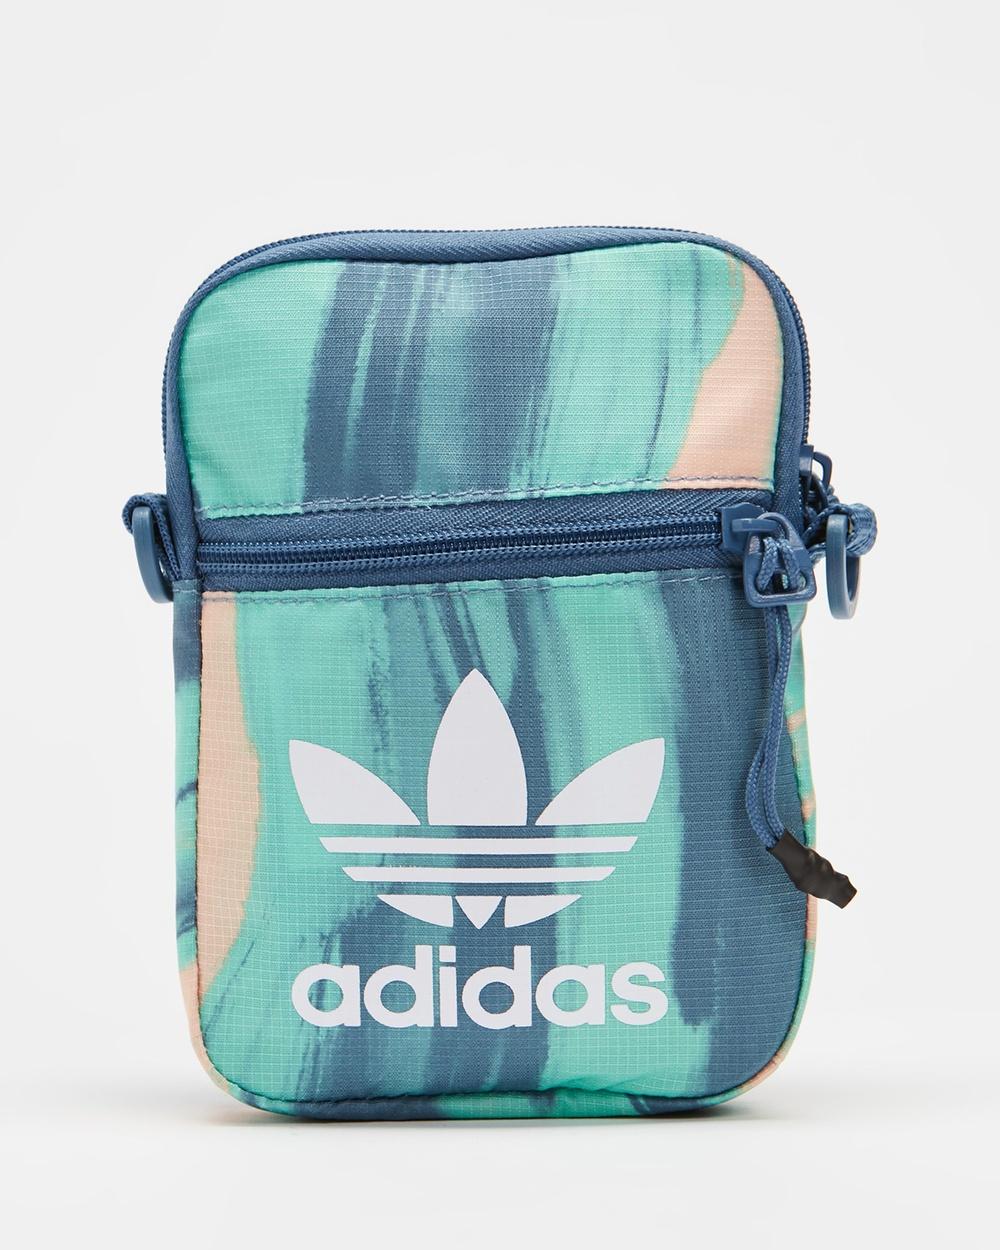 adidas Originals R.Y.V. Festival Bag Bags Vapour Pink, Crew Blue & White